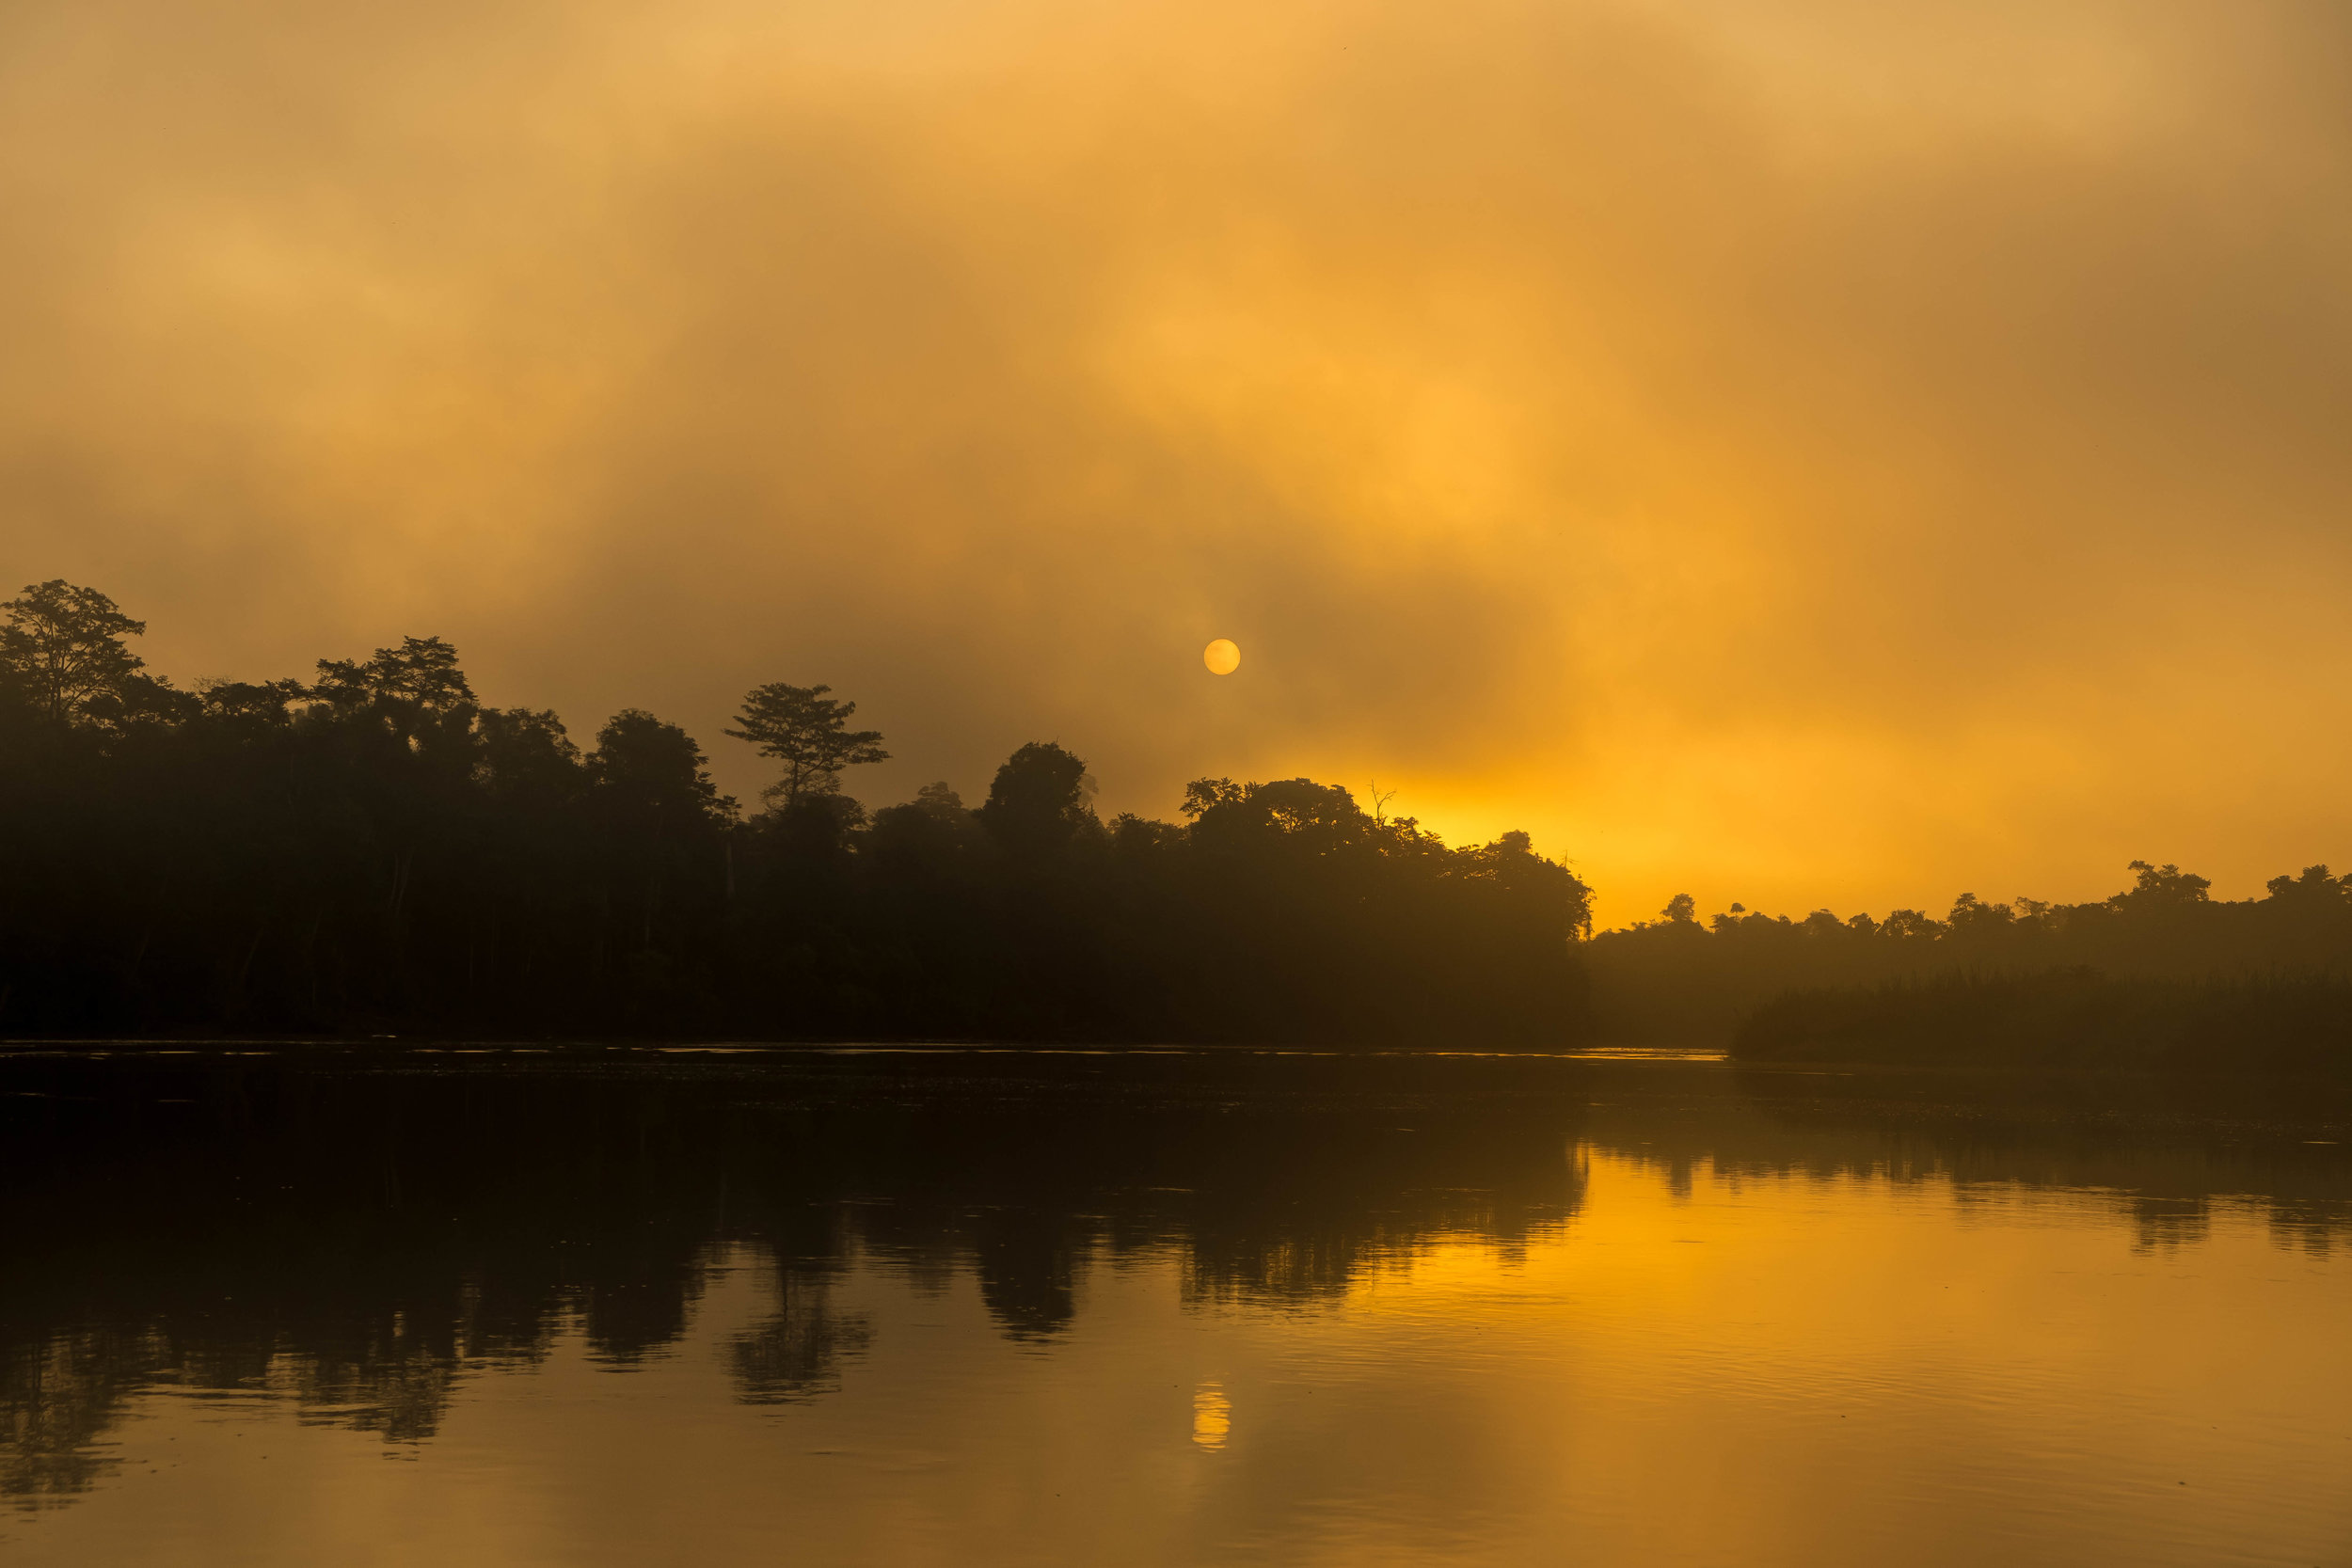 Sunrise through the fog on the Kinabatangan River